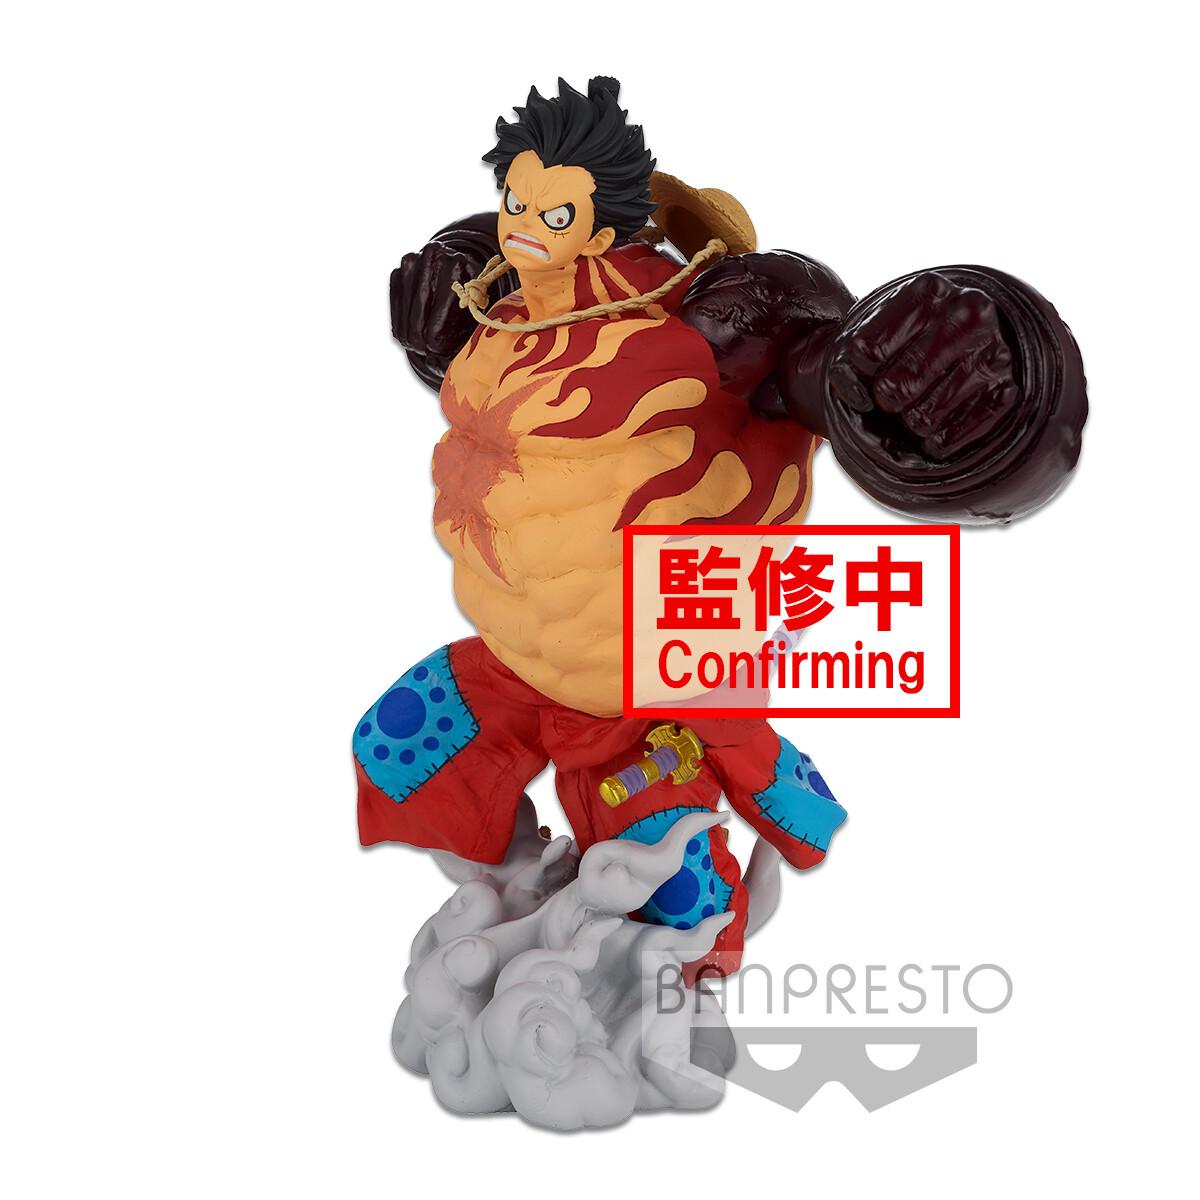 PRE-ORDER Banpresto One Piece Banpresto World Figure Colosseum 3 Super Master Stars Piece Monkey D Luffy Gear 4 The Original